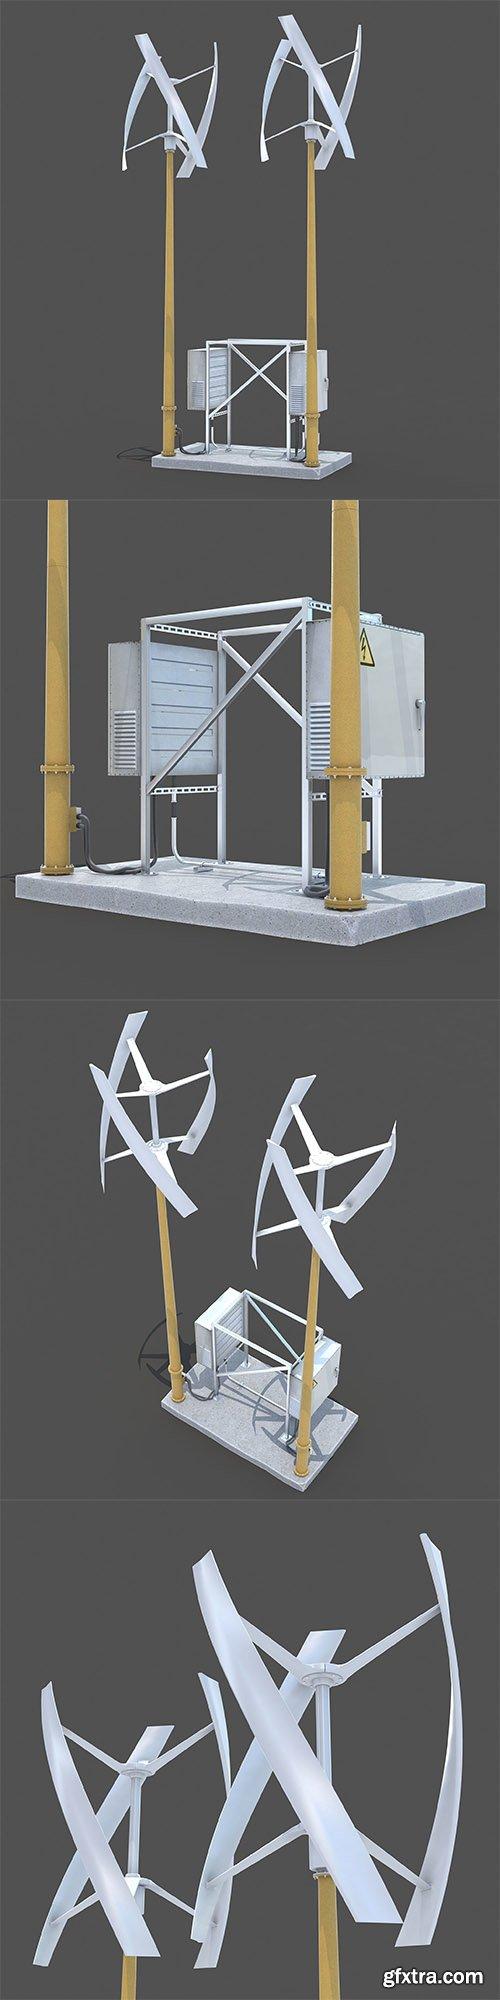 Cgtrader - Wind generator 3D model